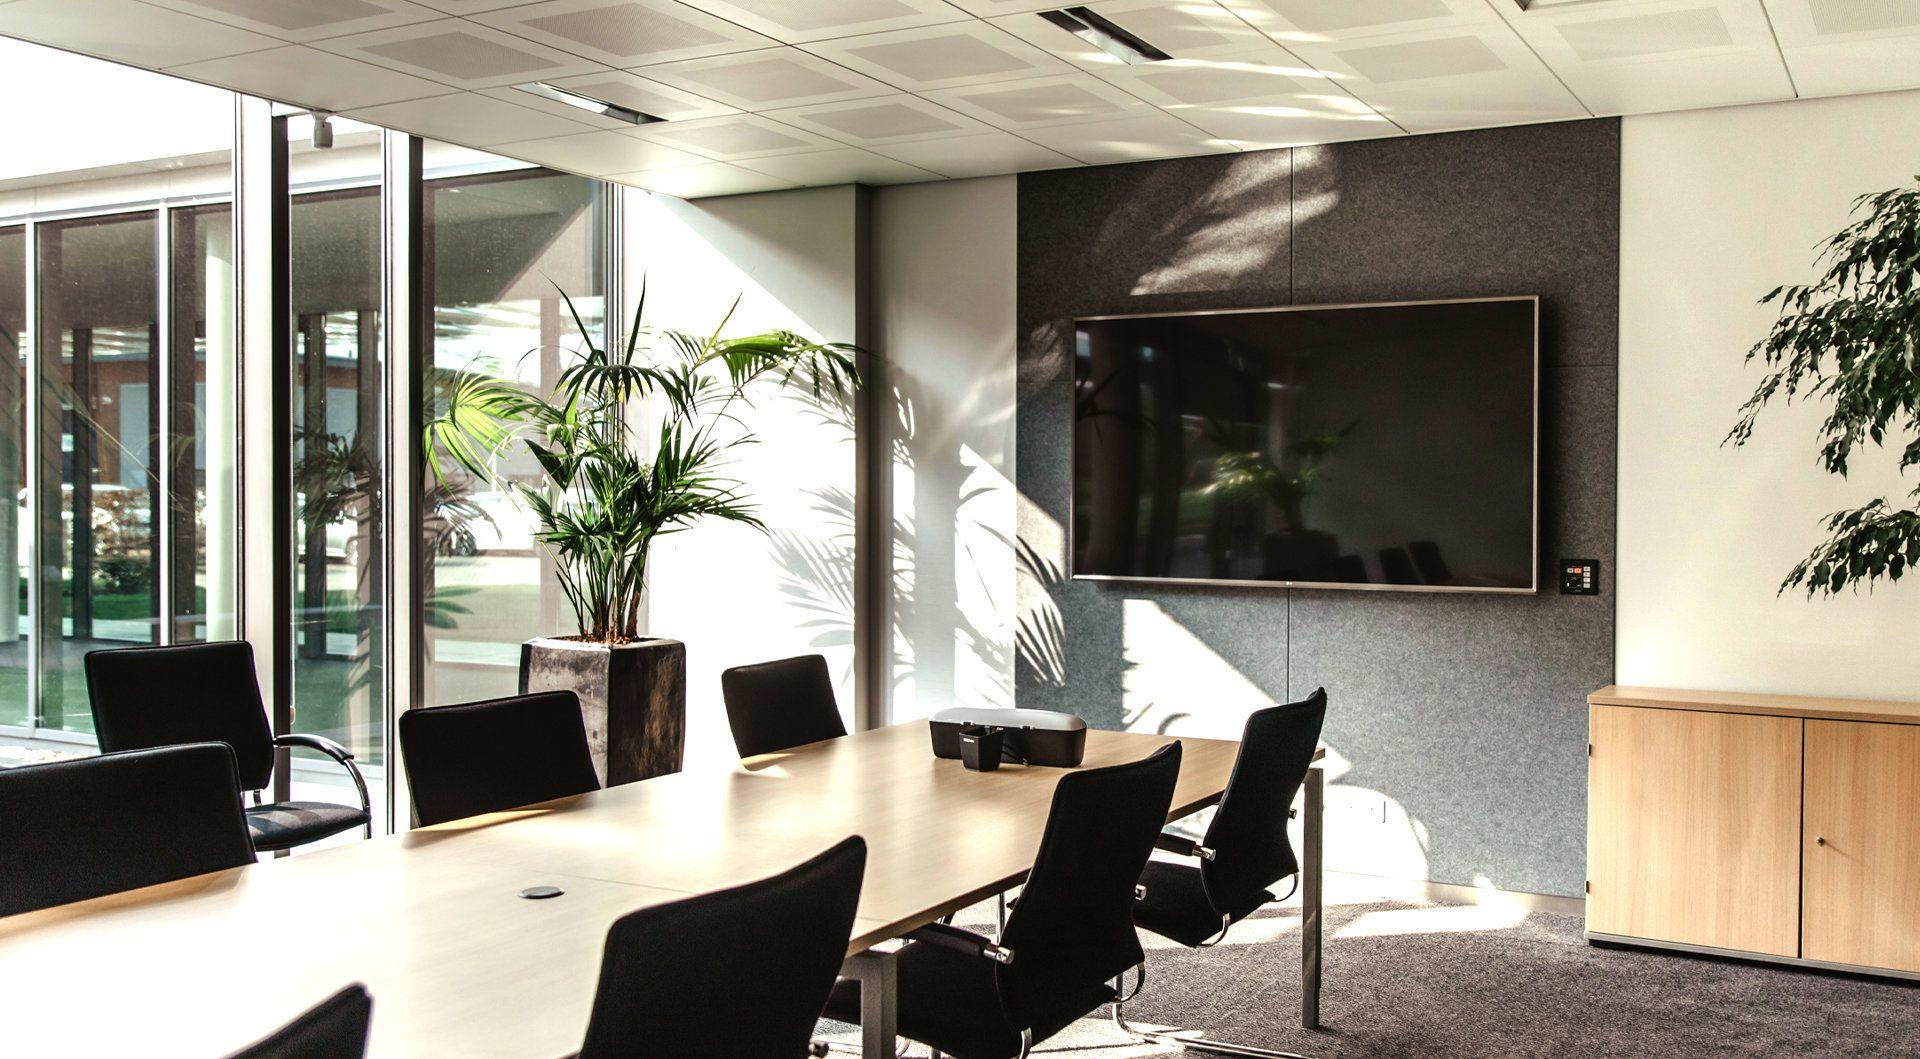 "LG 49VH7E-A beeldkrant 124,5 cm (49"") LED Full HD Digitale signage flatscreen Zwart - Case studie de vries"